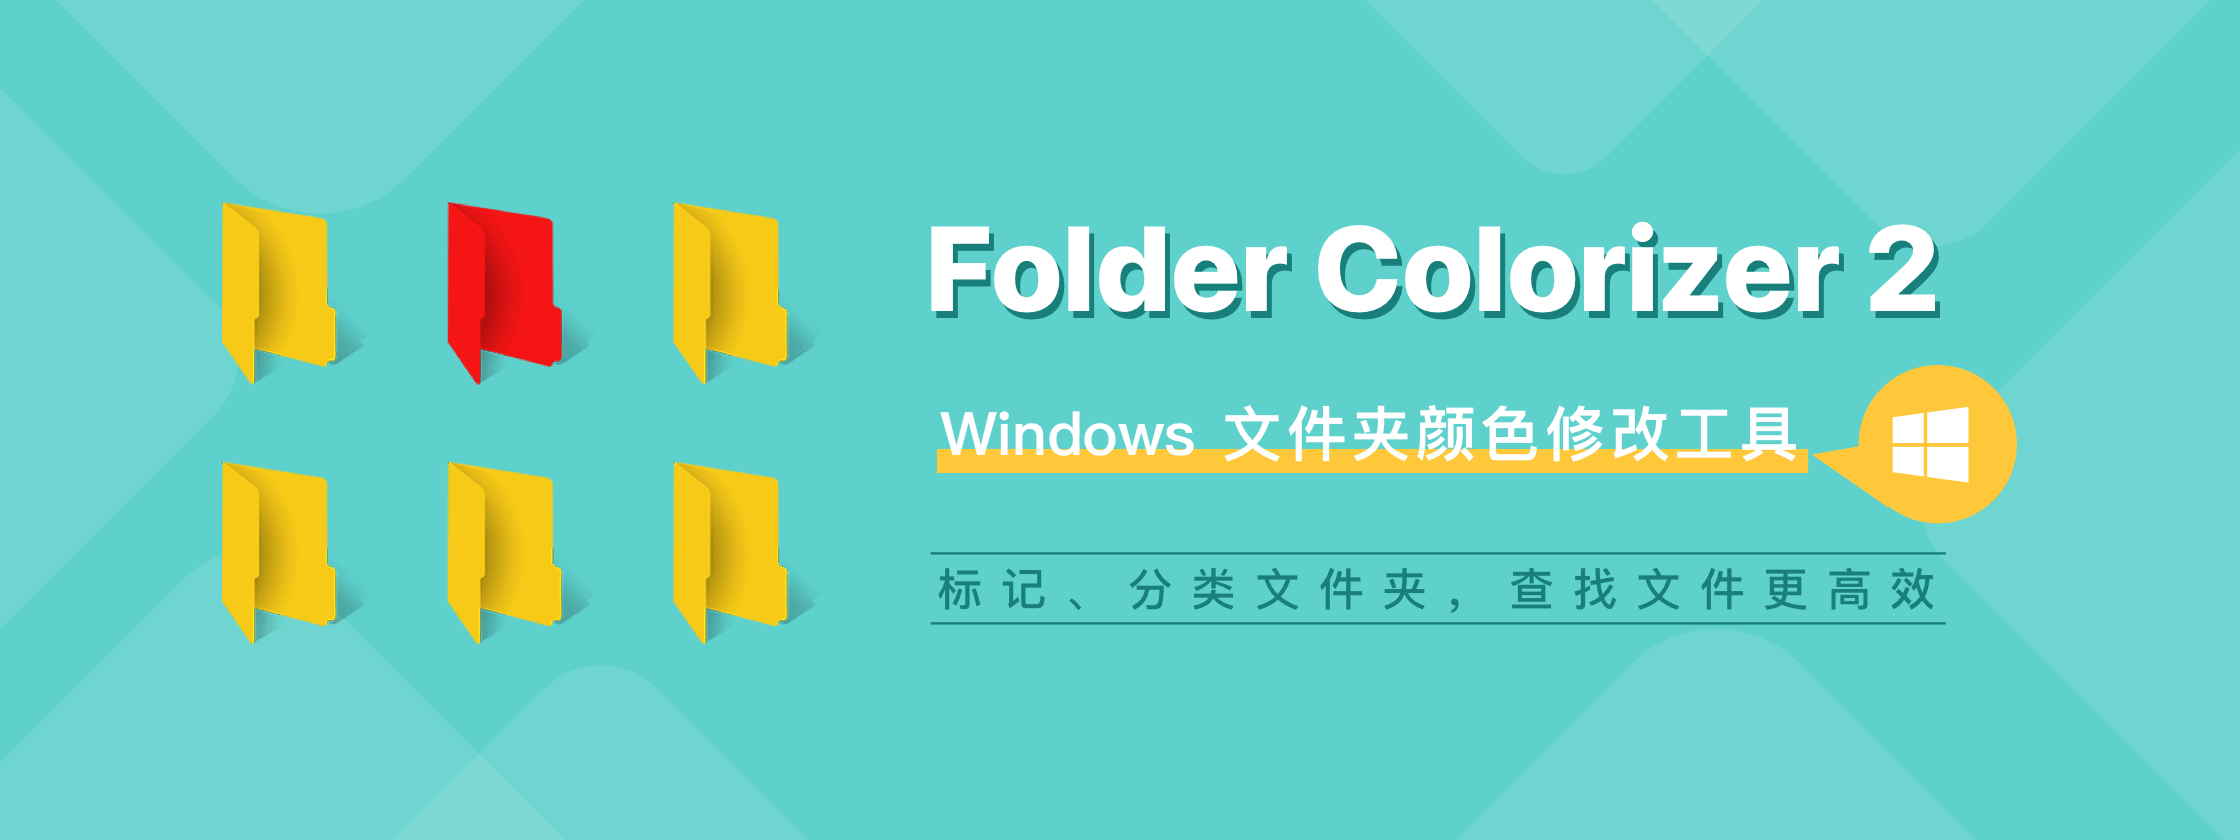 Folder Colorizer 2 – 文件夹一键着色,让目标更突出